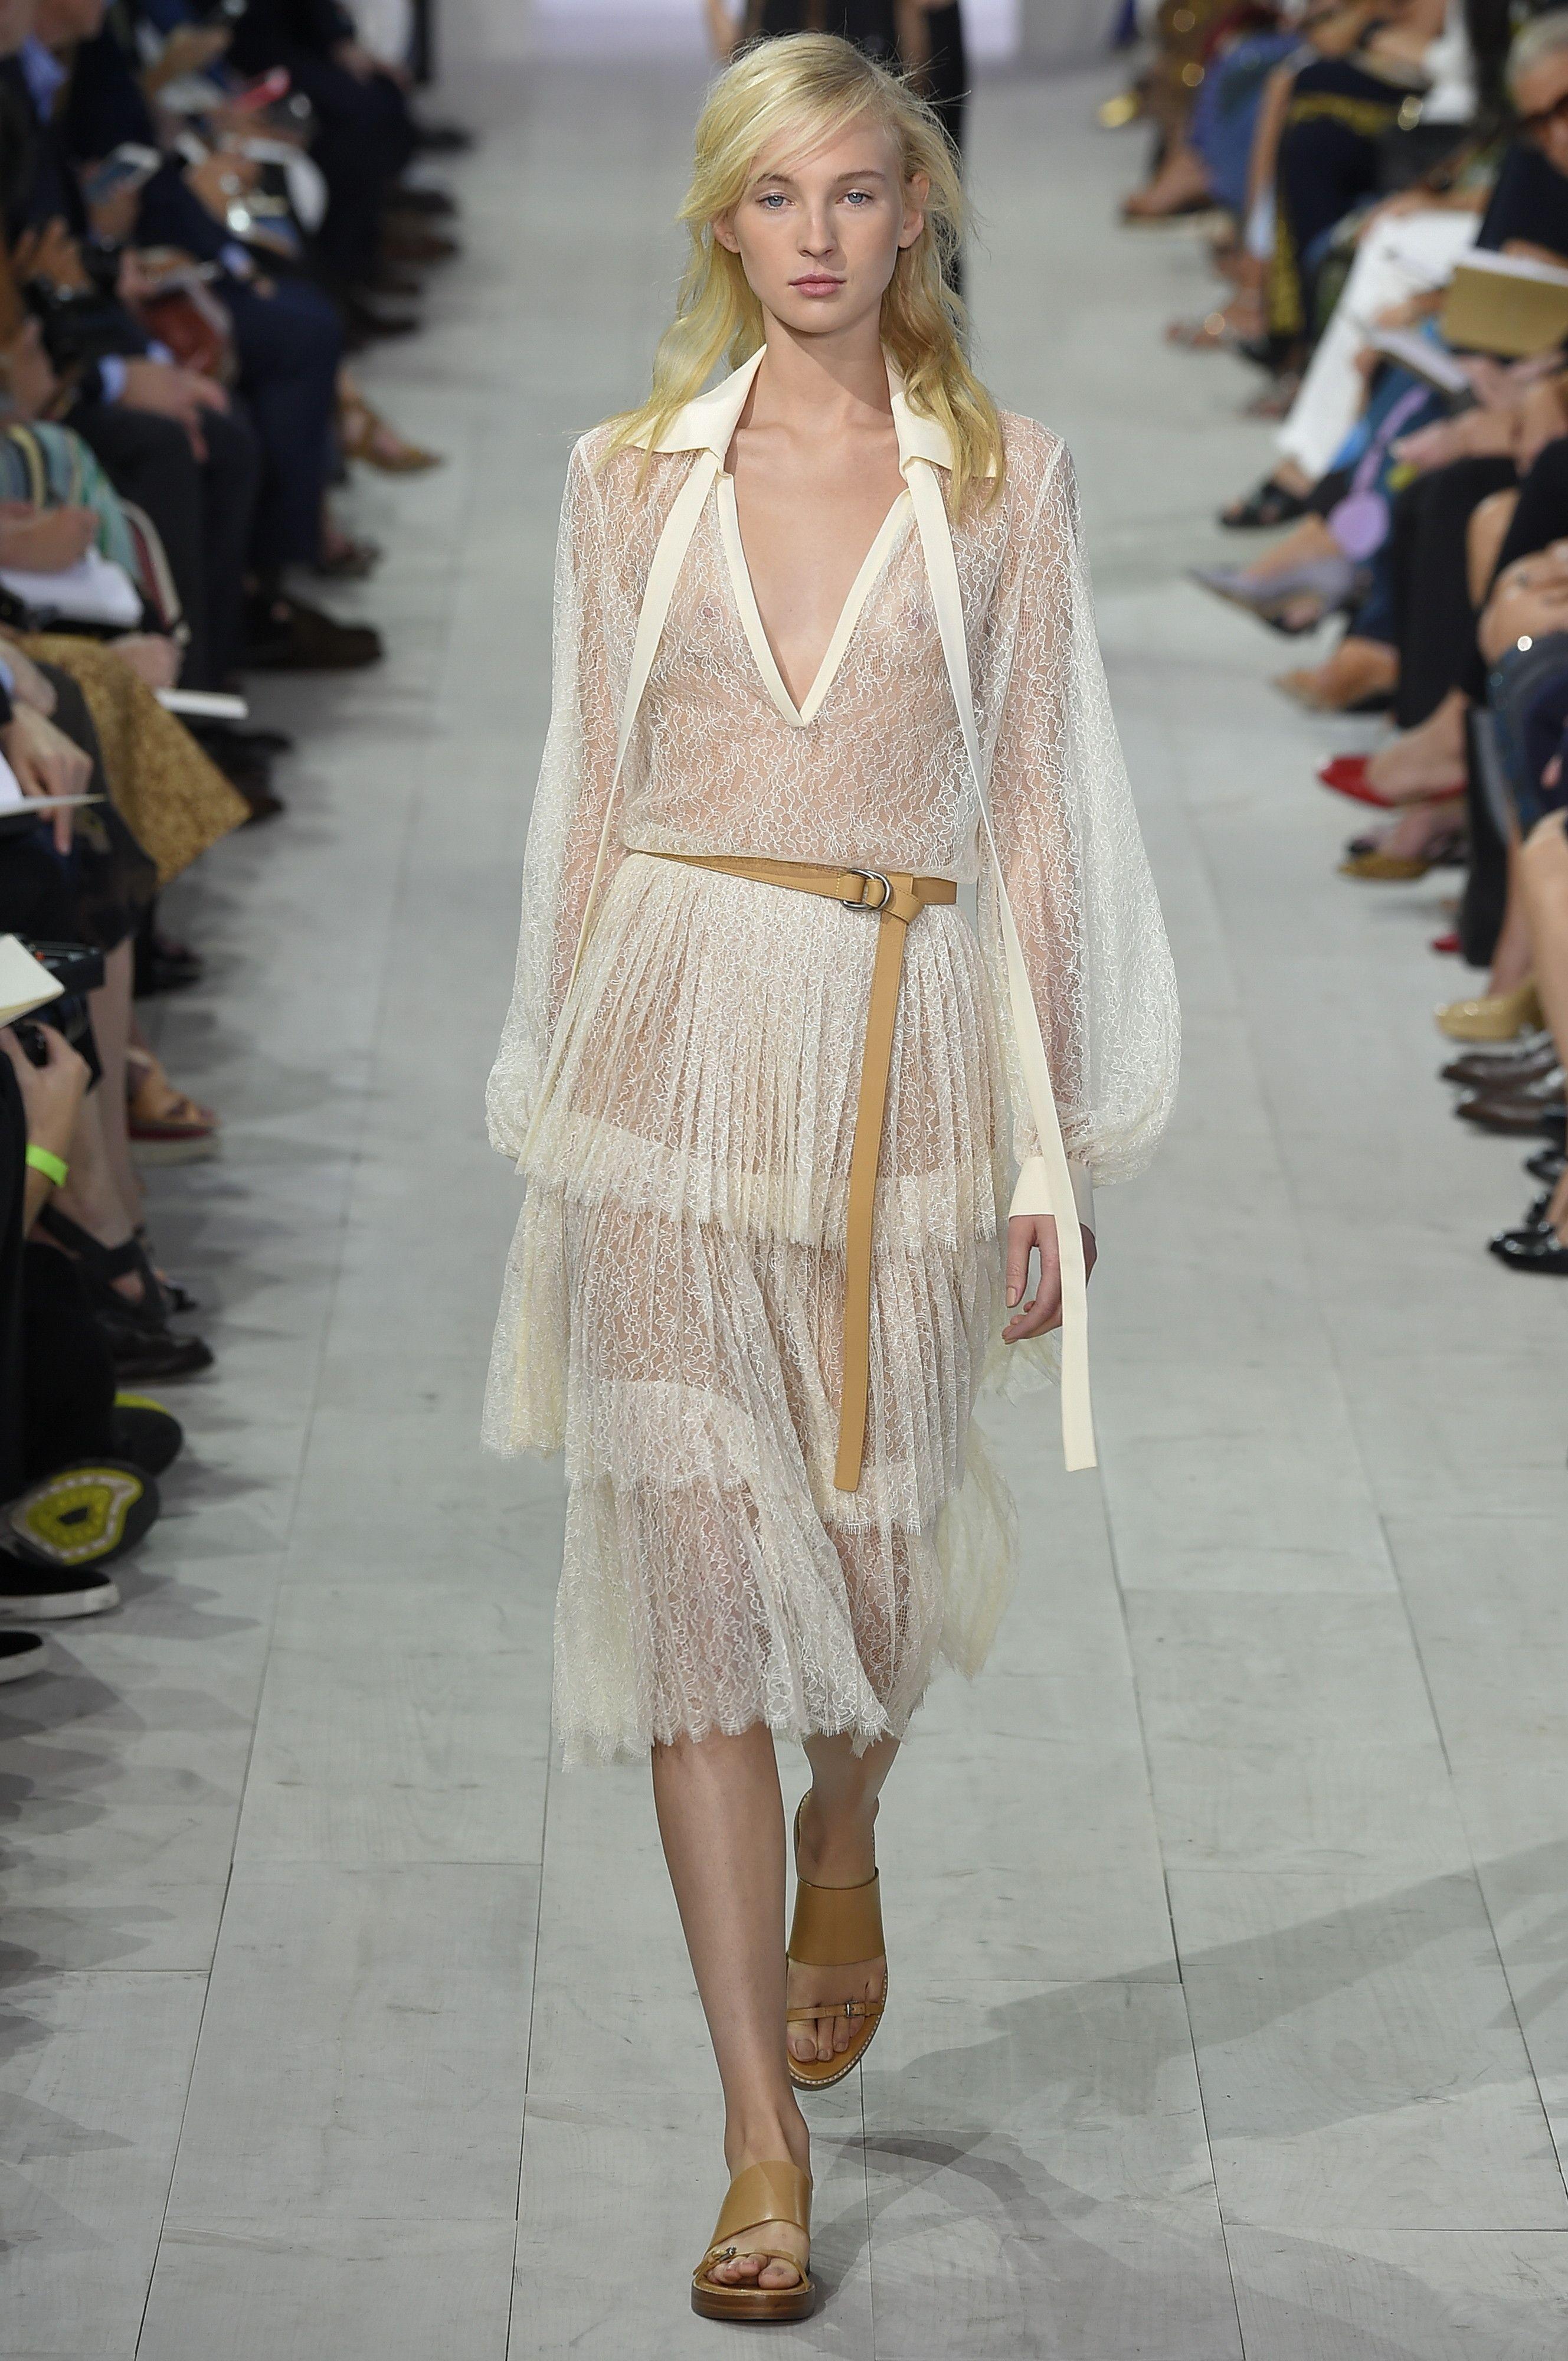 #Michael_Kors #Renda #Plissada #Off #White #Dress #Desfile #Vestido #Trend